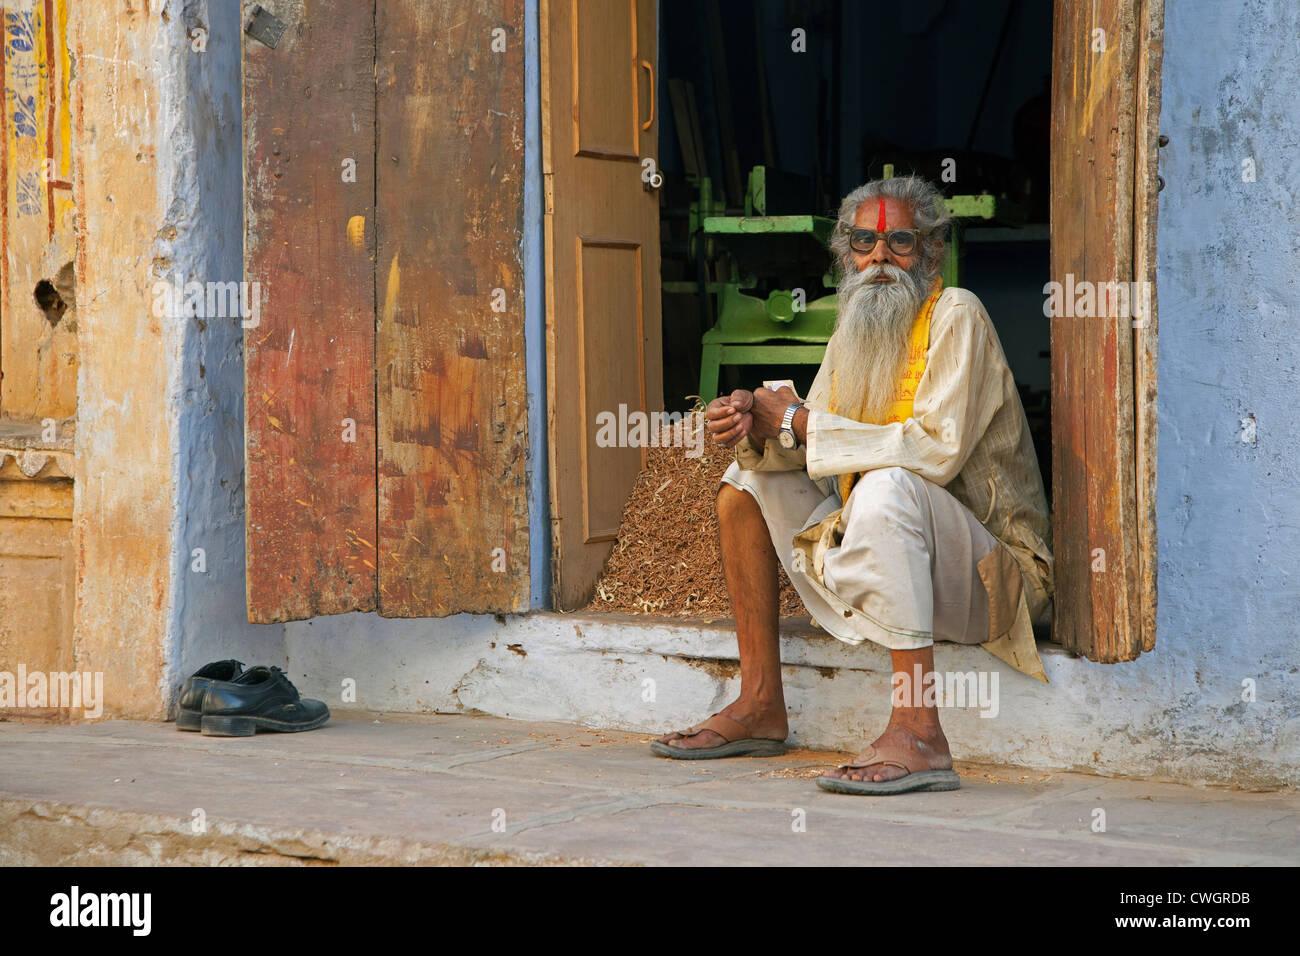 Old Indian man in traditional dress wearing spectacles, Bundi, Rajasthan, India - Stock Image